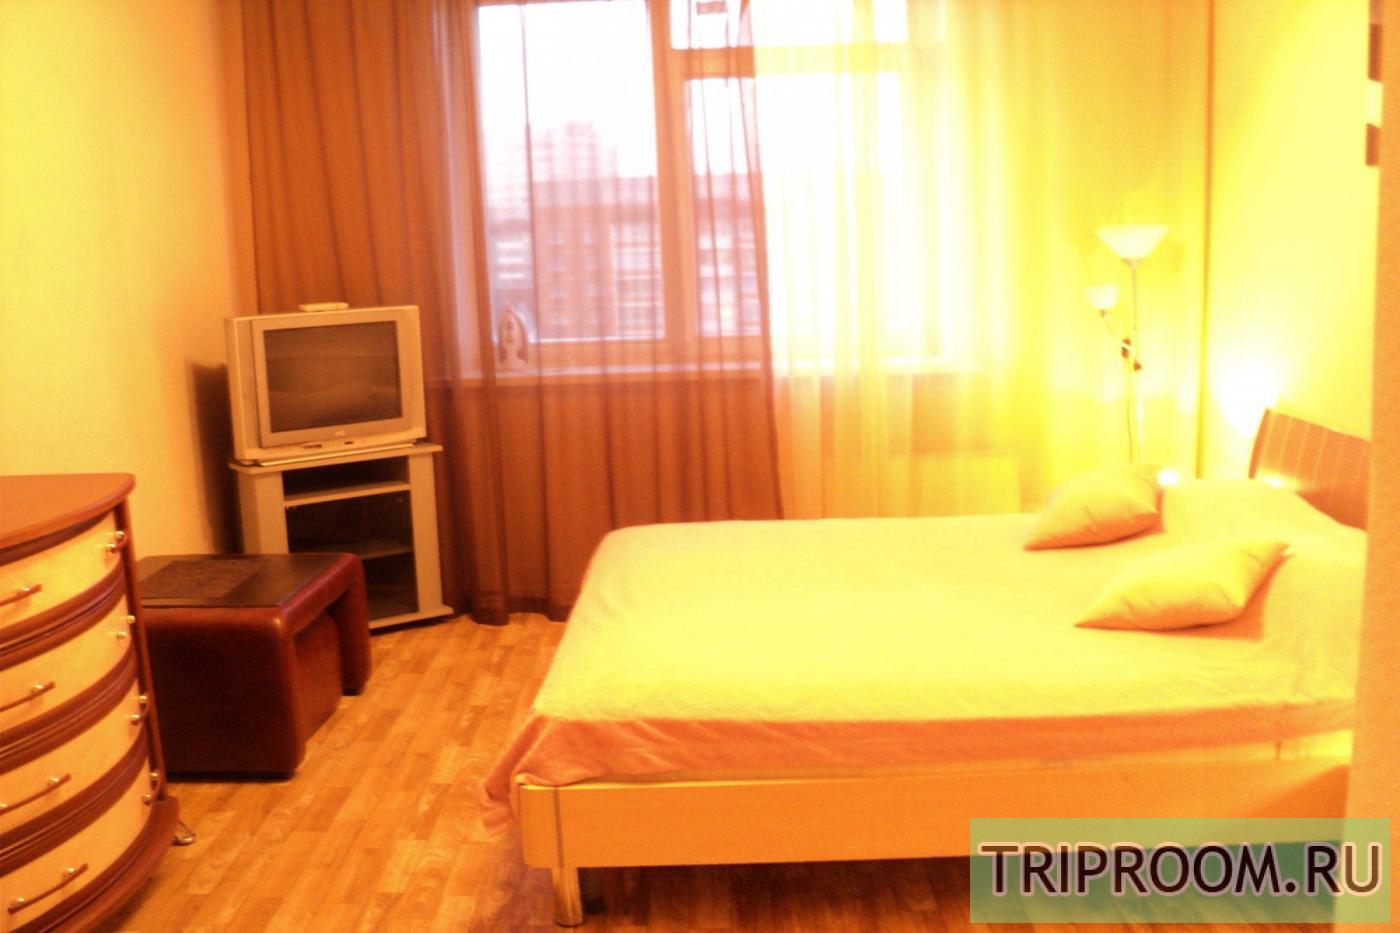 1-комнатная квартира посуточно (вариант № 5905), ул. Алексеева улица, фото № 2